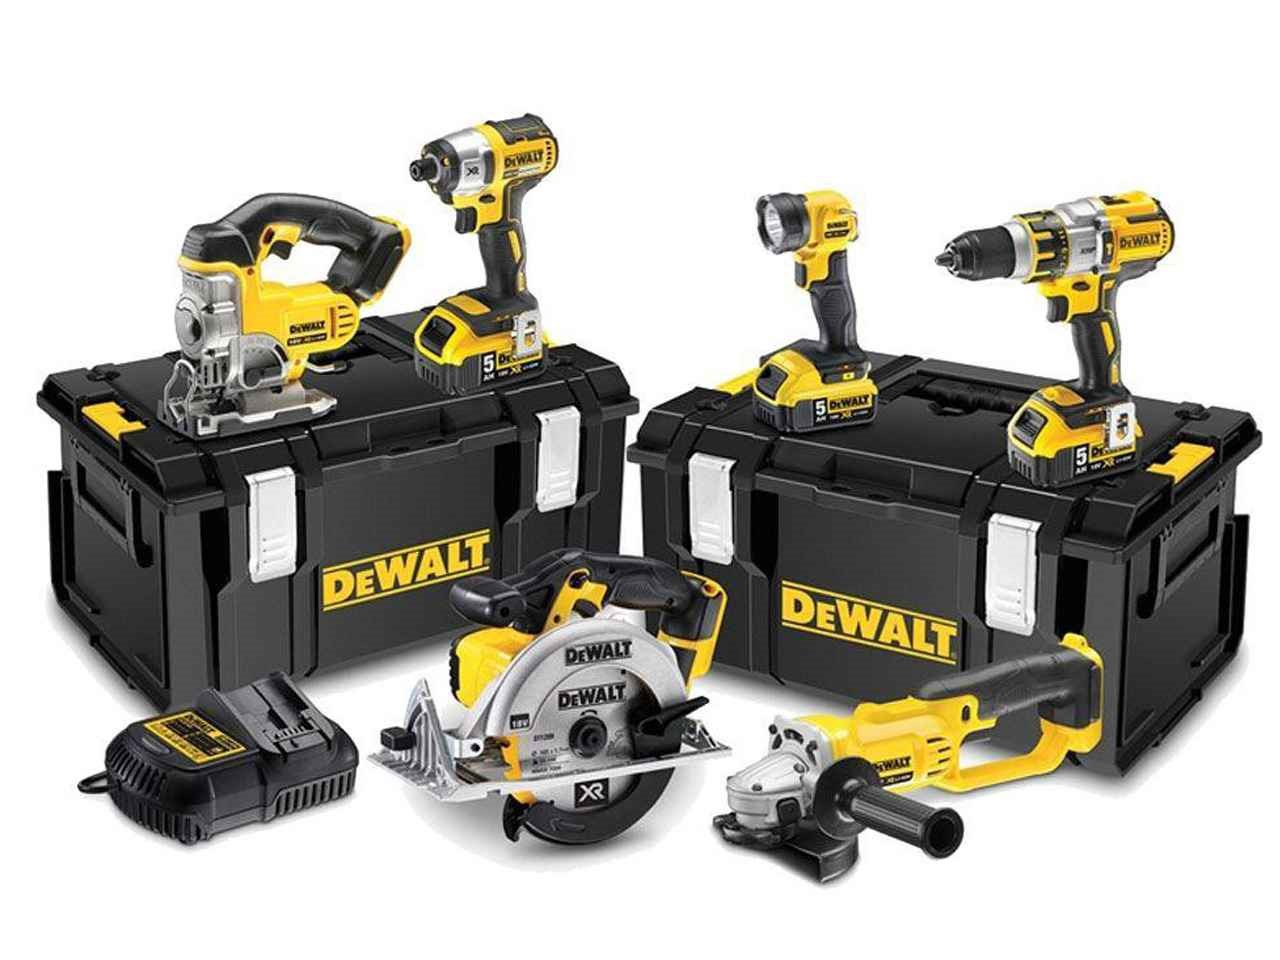 Dewalt Dck694p3 Brushless 18v Cordless 6pc Kit 3 X 5 0ah